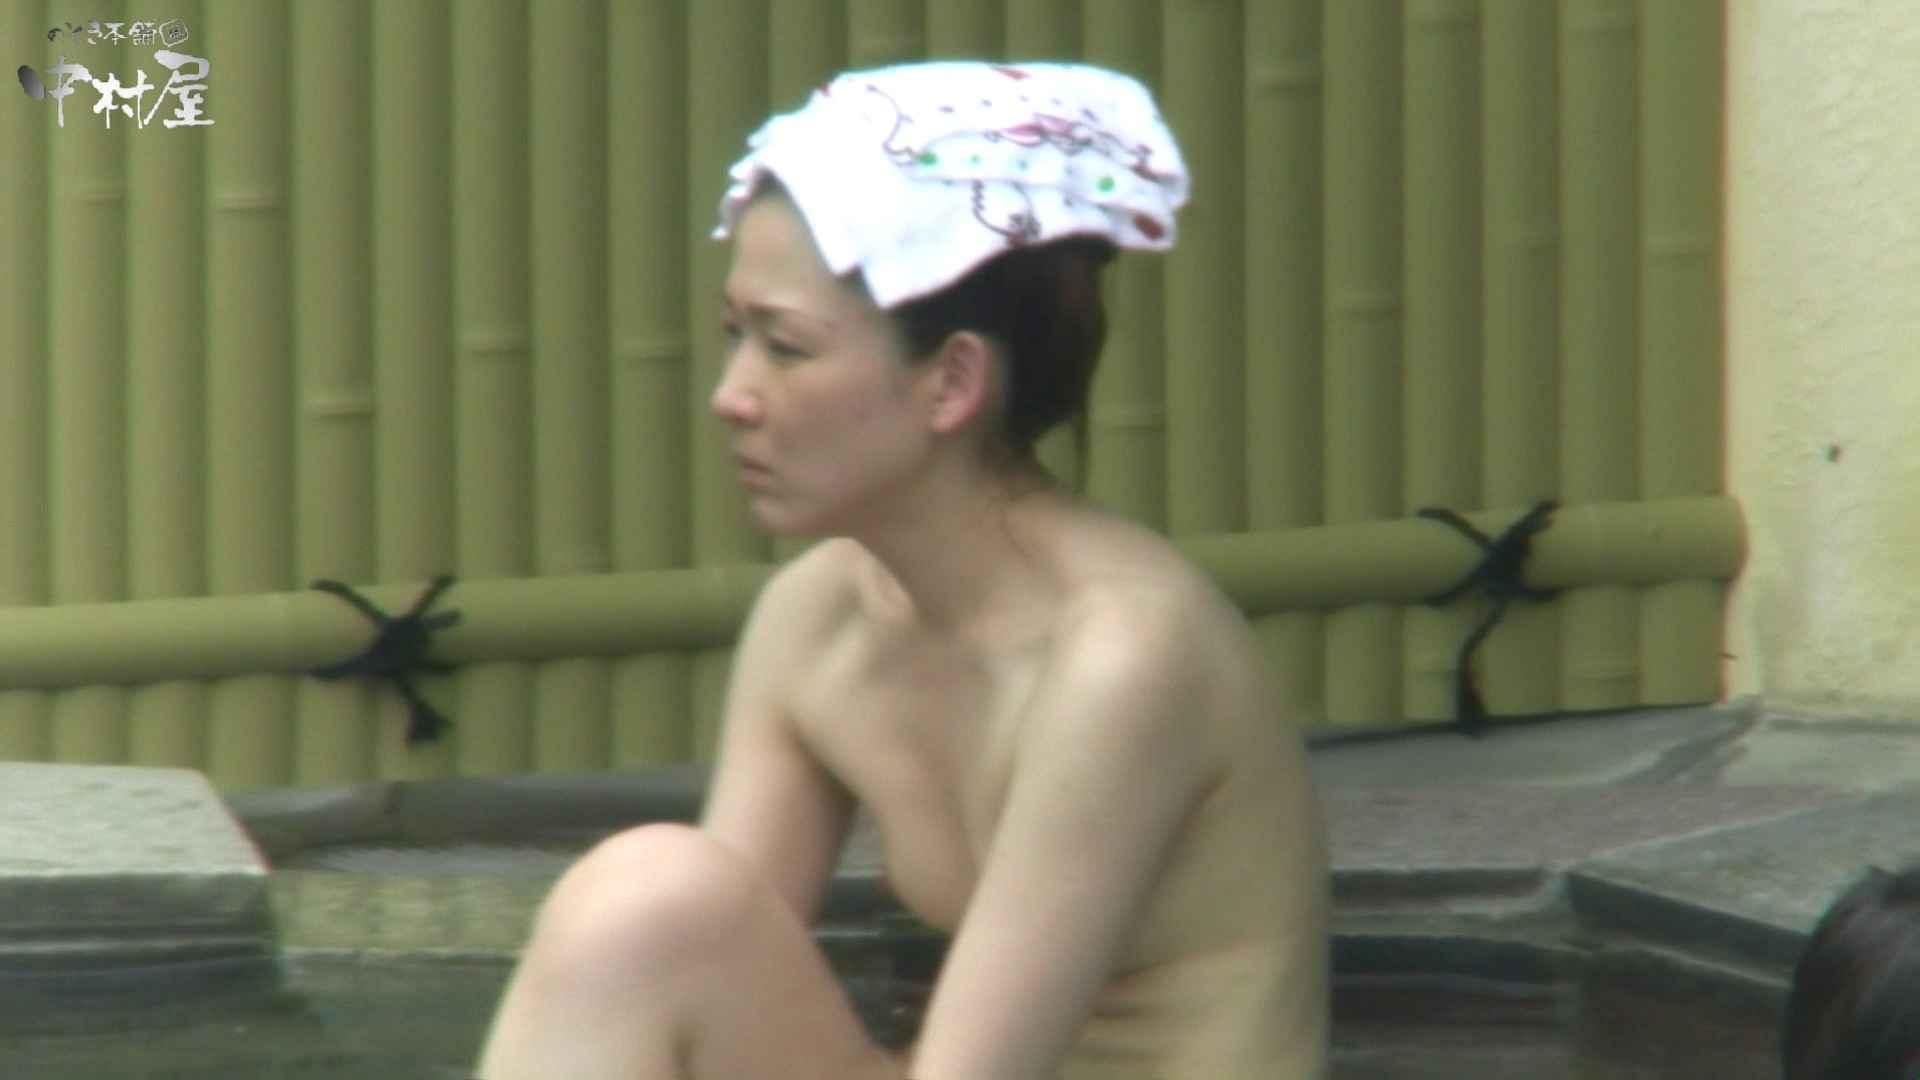 Aquaな露天風呂Vol.943 盗撮 セックス無修正動画無料 108画像 41